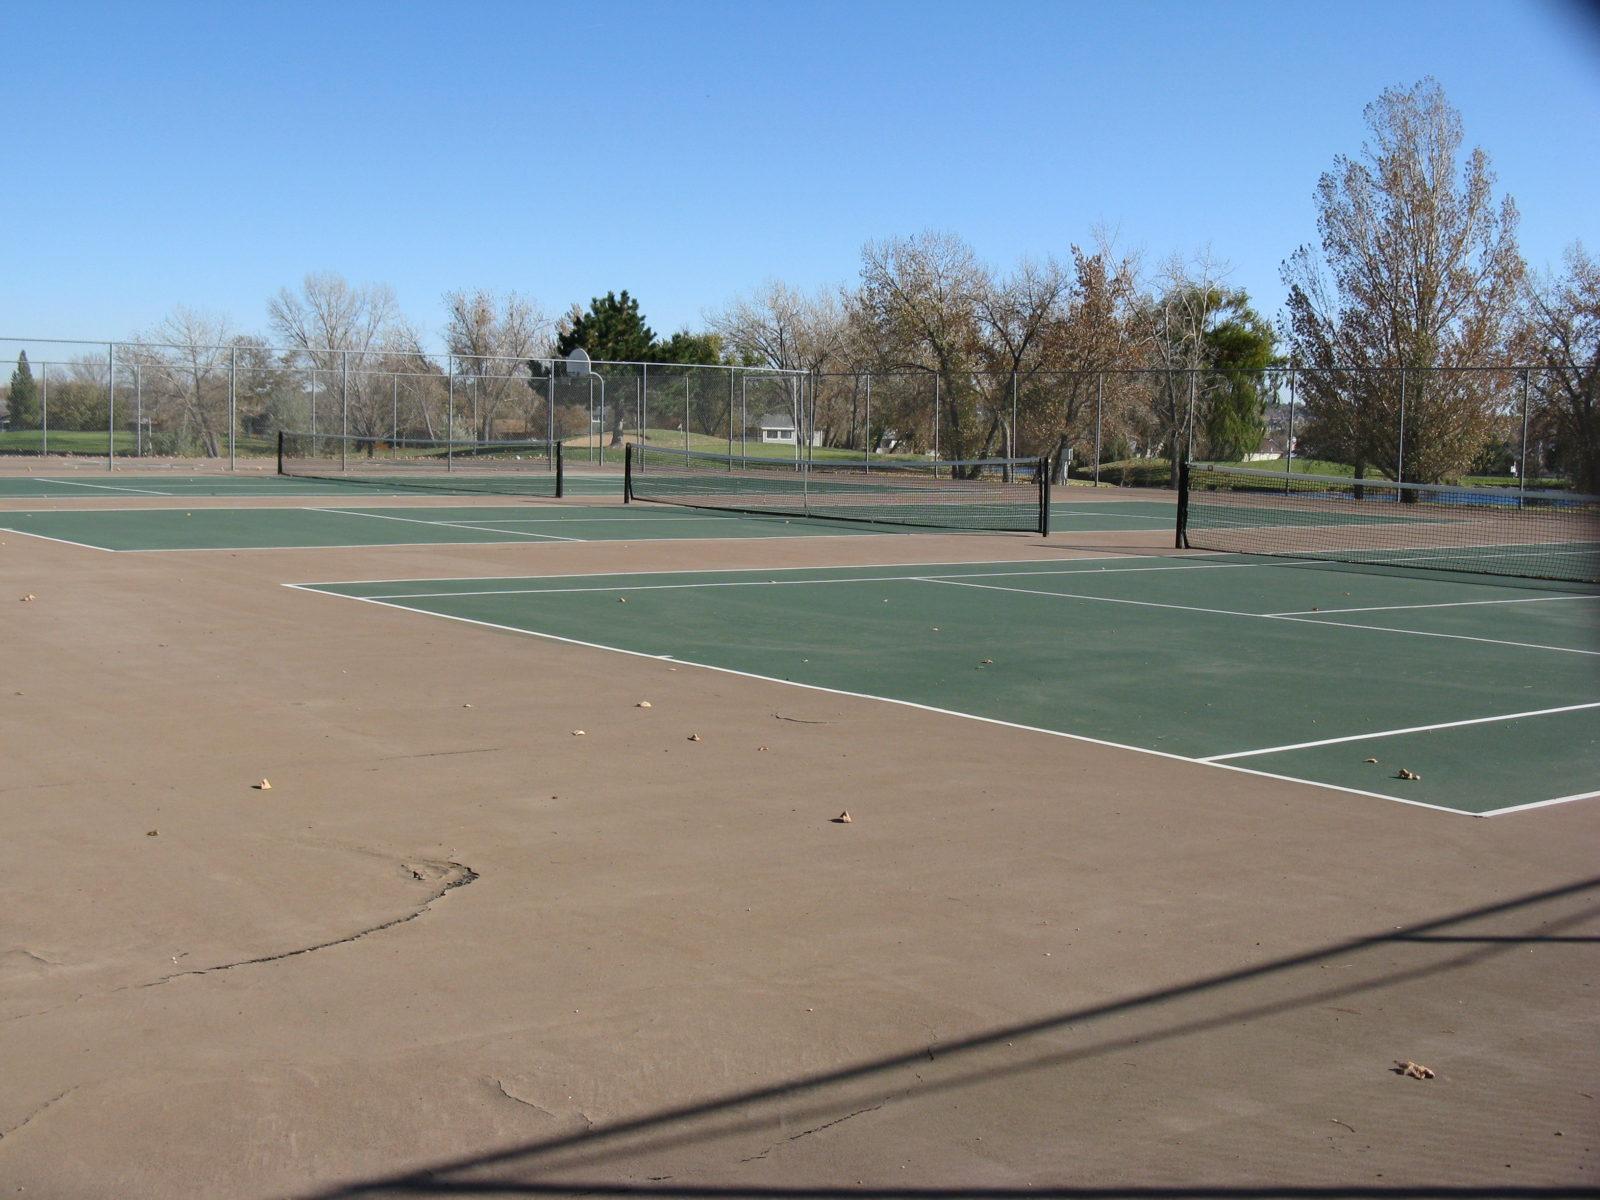 231 tennis